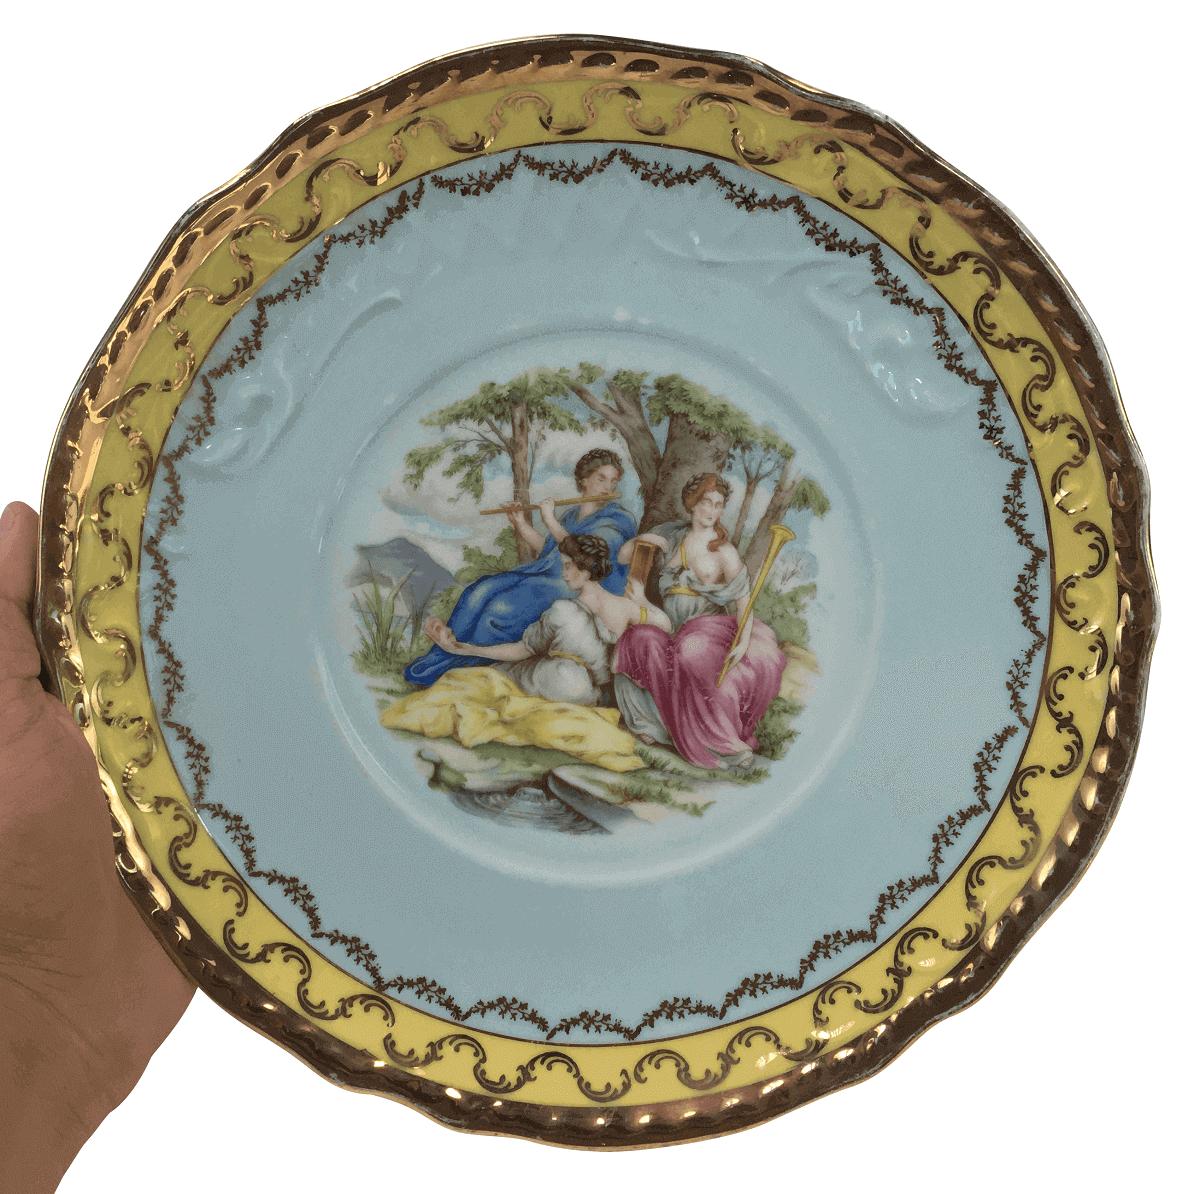 Magnifico Prato Bolo Porcelana Antiga Polovi 27cm